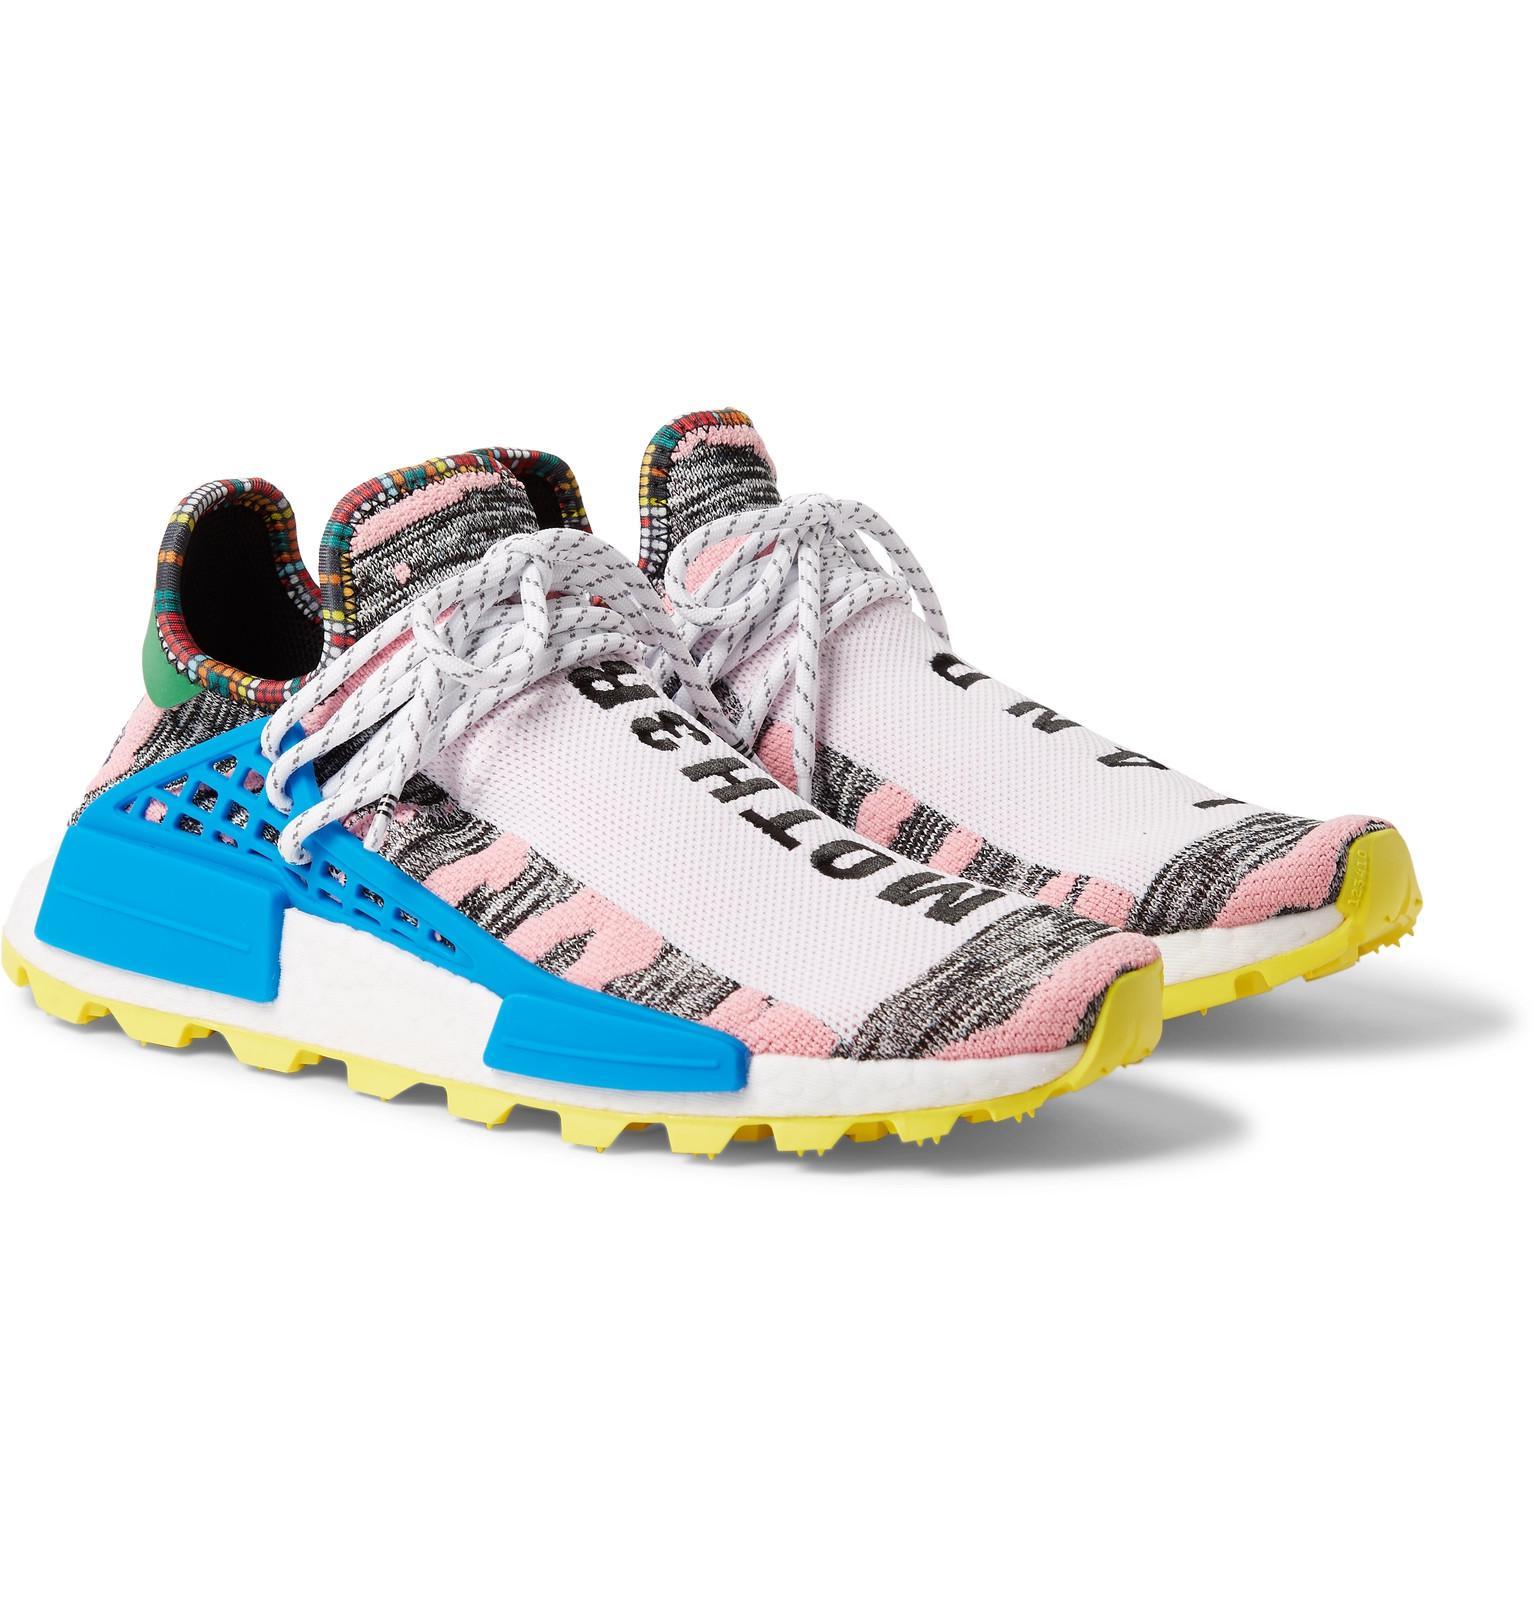 acfc1d31a adidas Originals + Pharrell Williams Solarhu Nmd Primeknit Sneakers ...